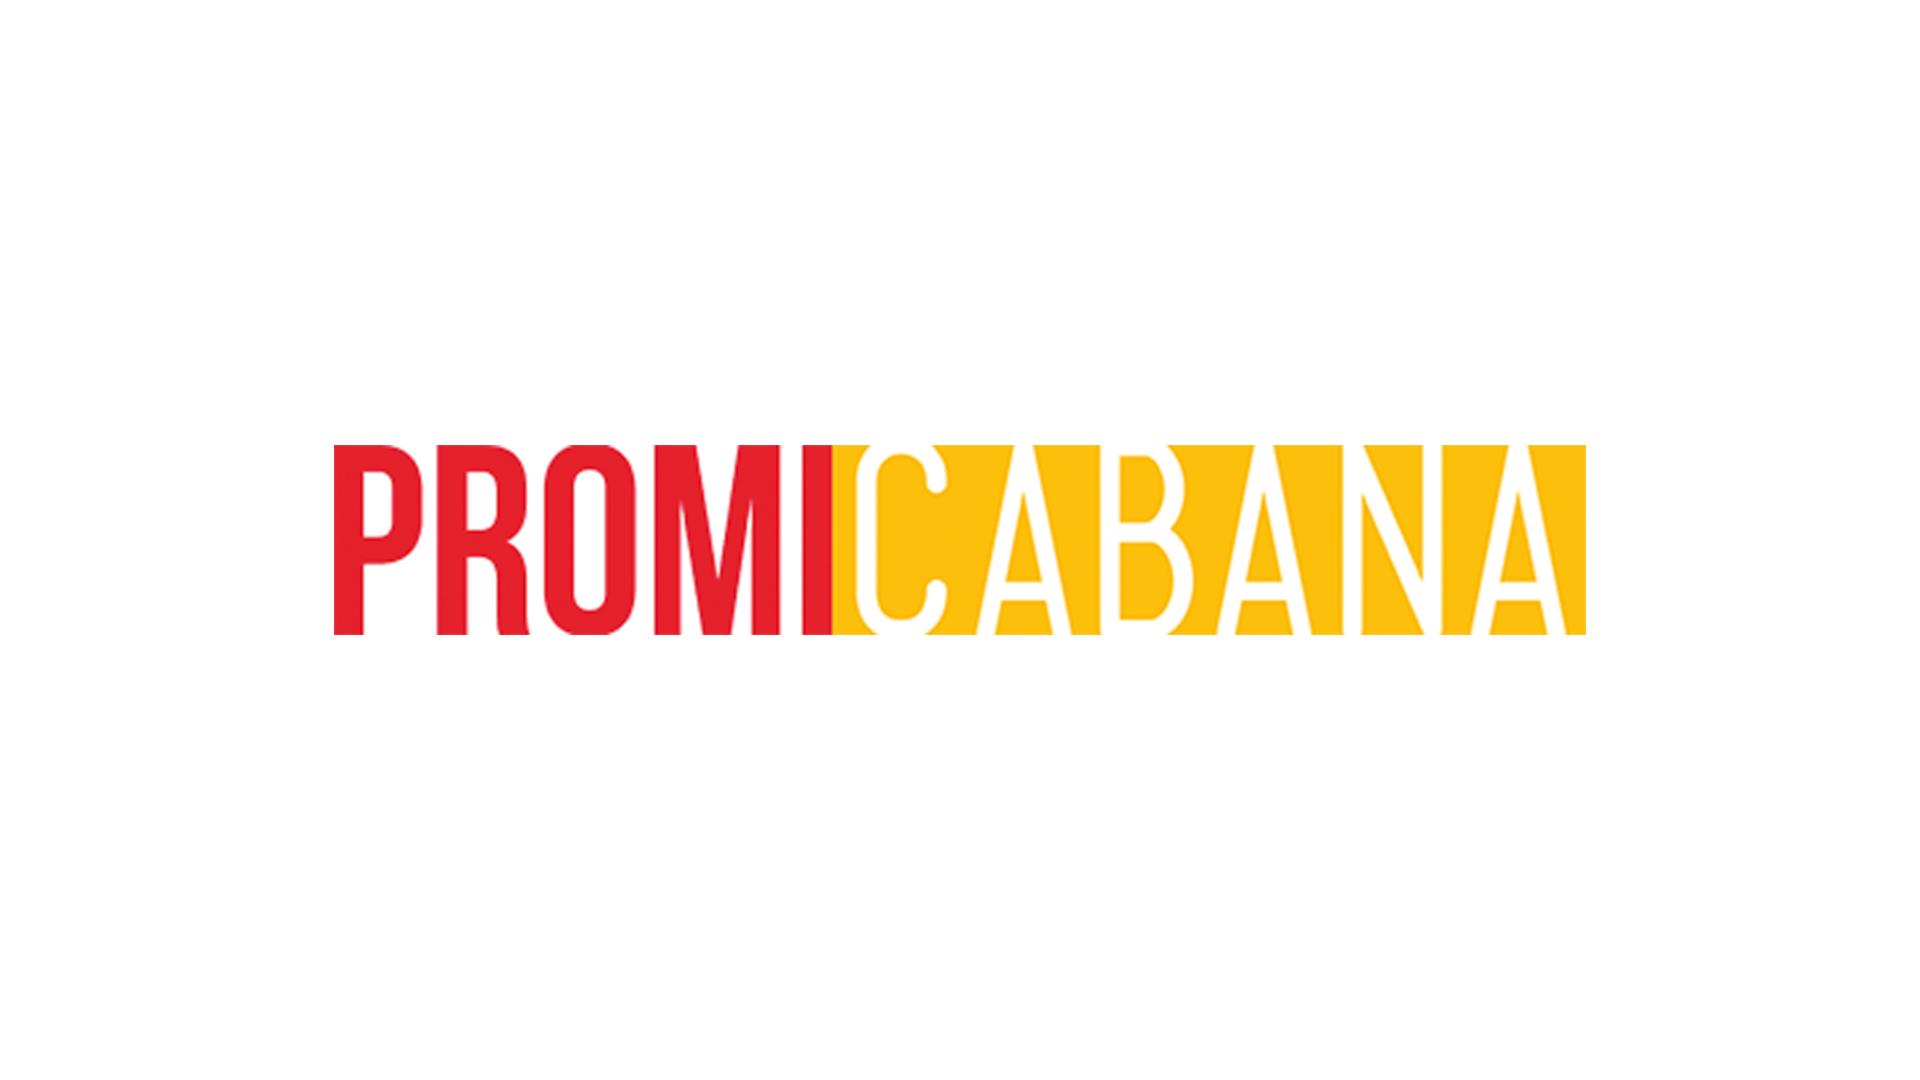 Donald-Trump-Charlie-Sheen